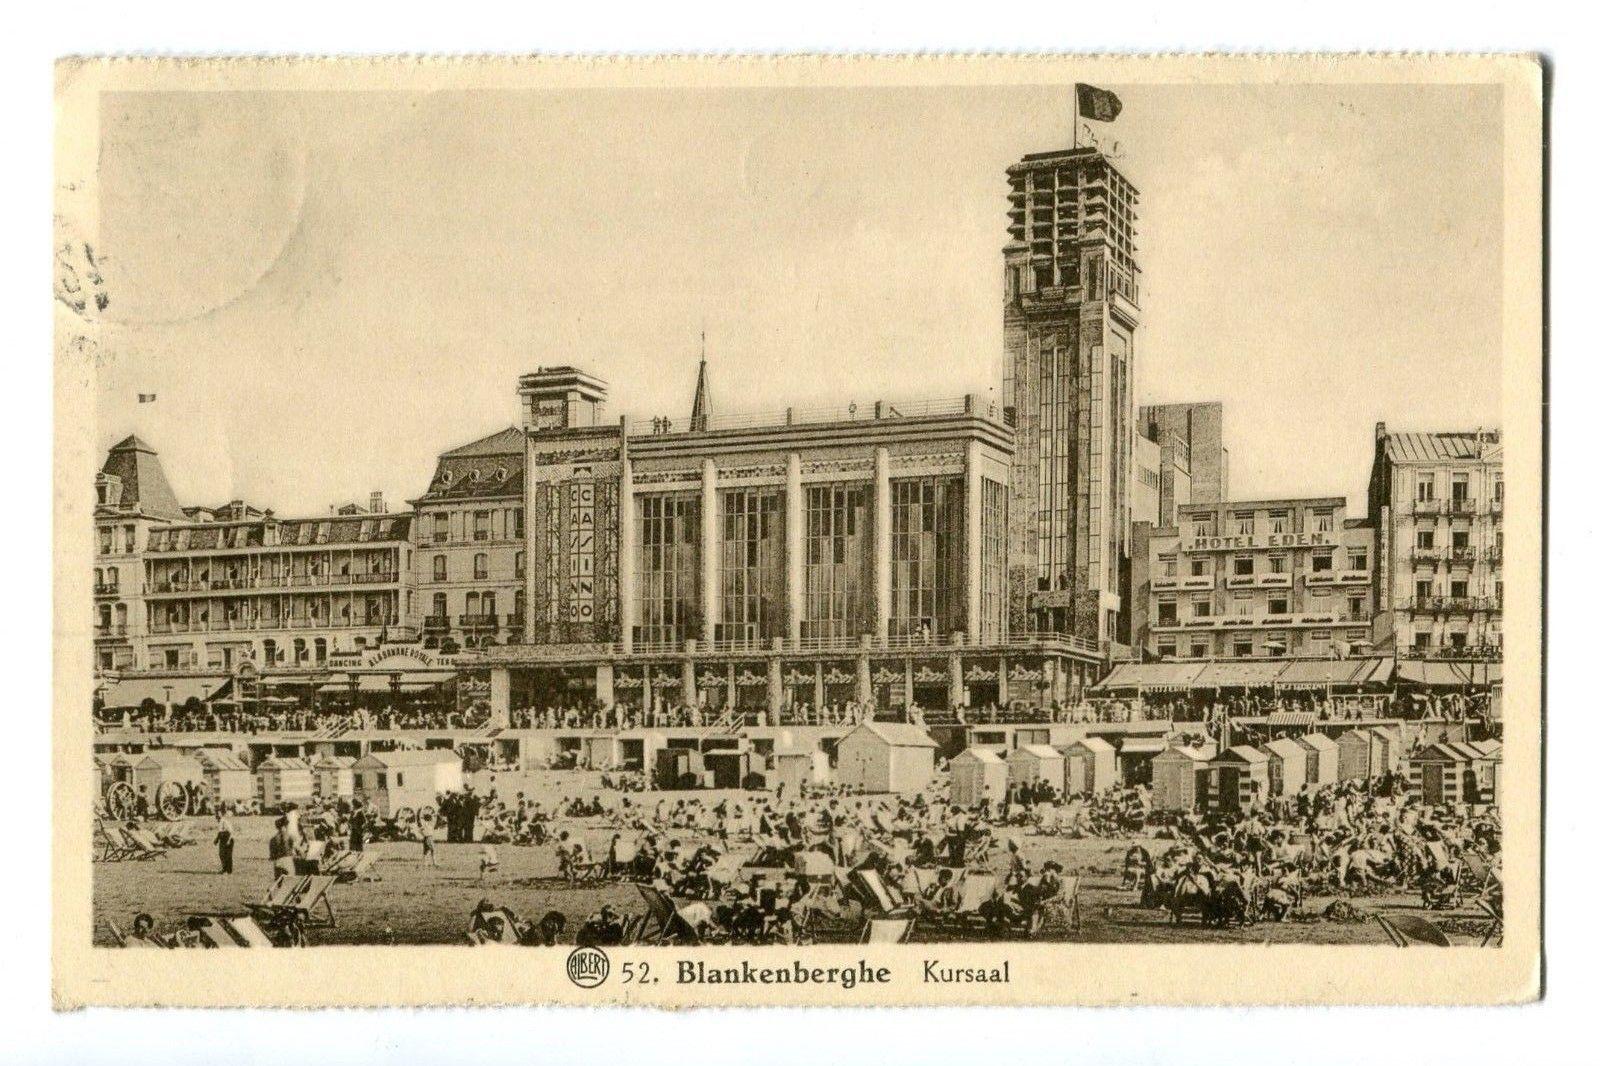 CPA - Carte postale - Belgique - Blankenberge - Kursaal - Années 30 (CP157)